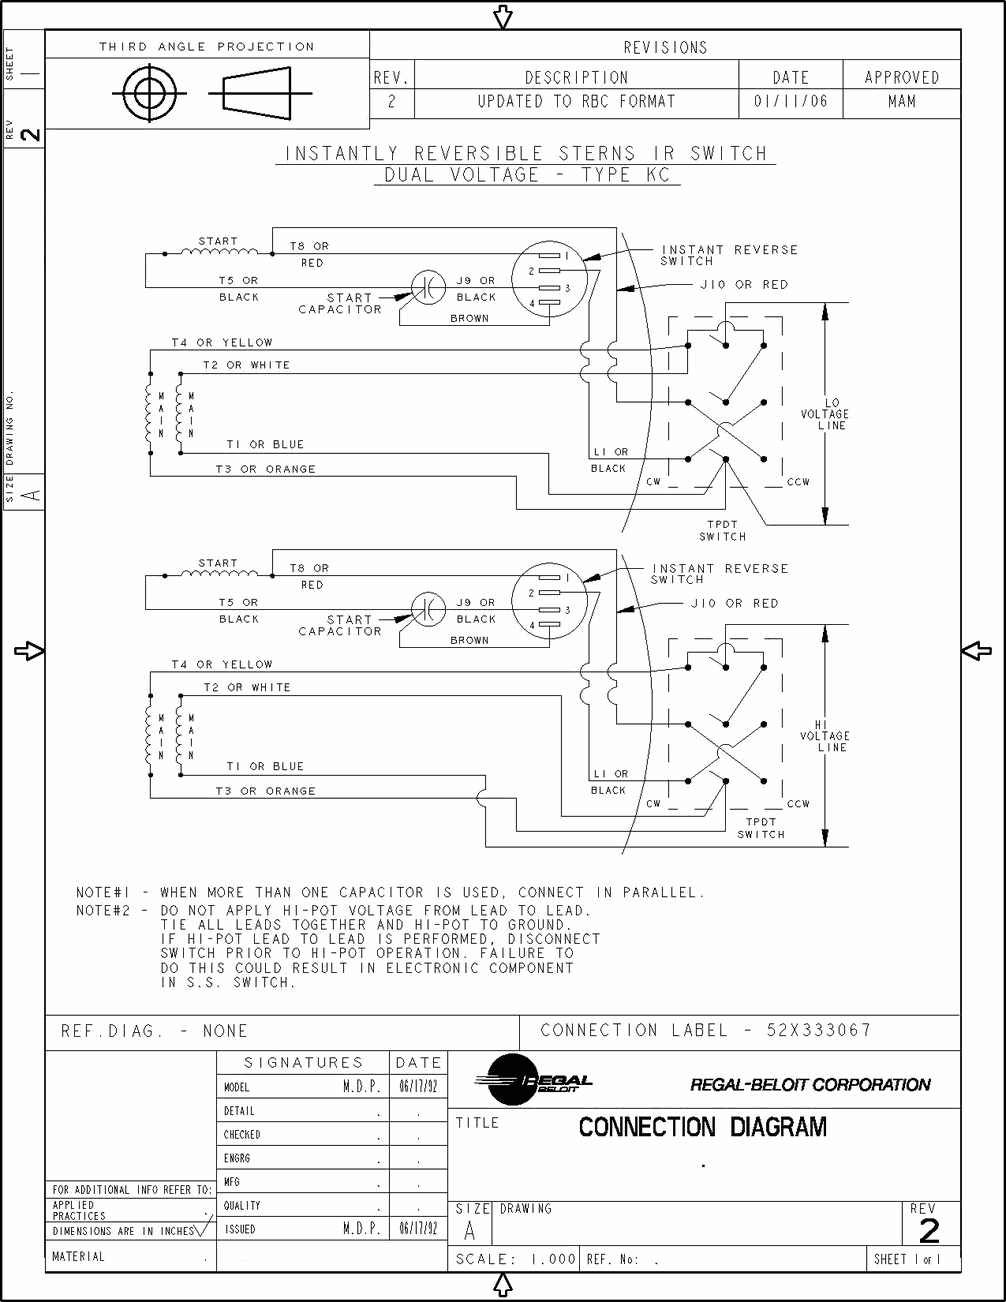 Wiring Diagram 115230 Motor Ao Smith | Wiring Diagram on